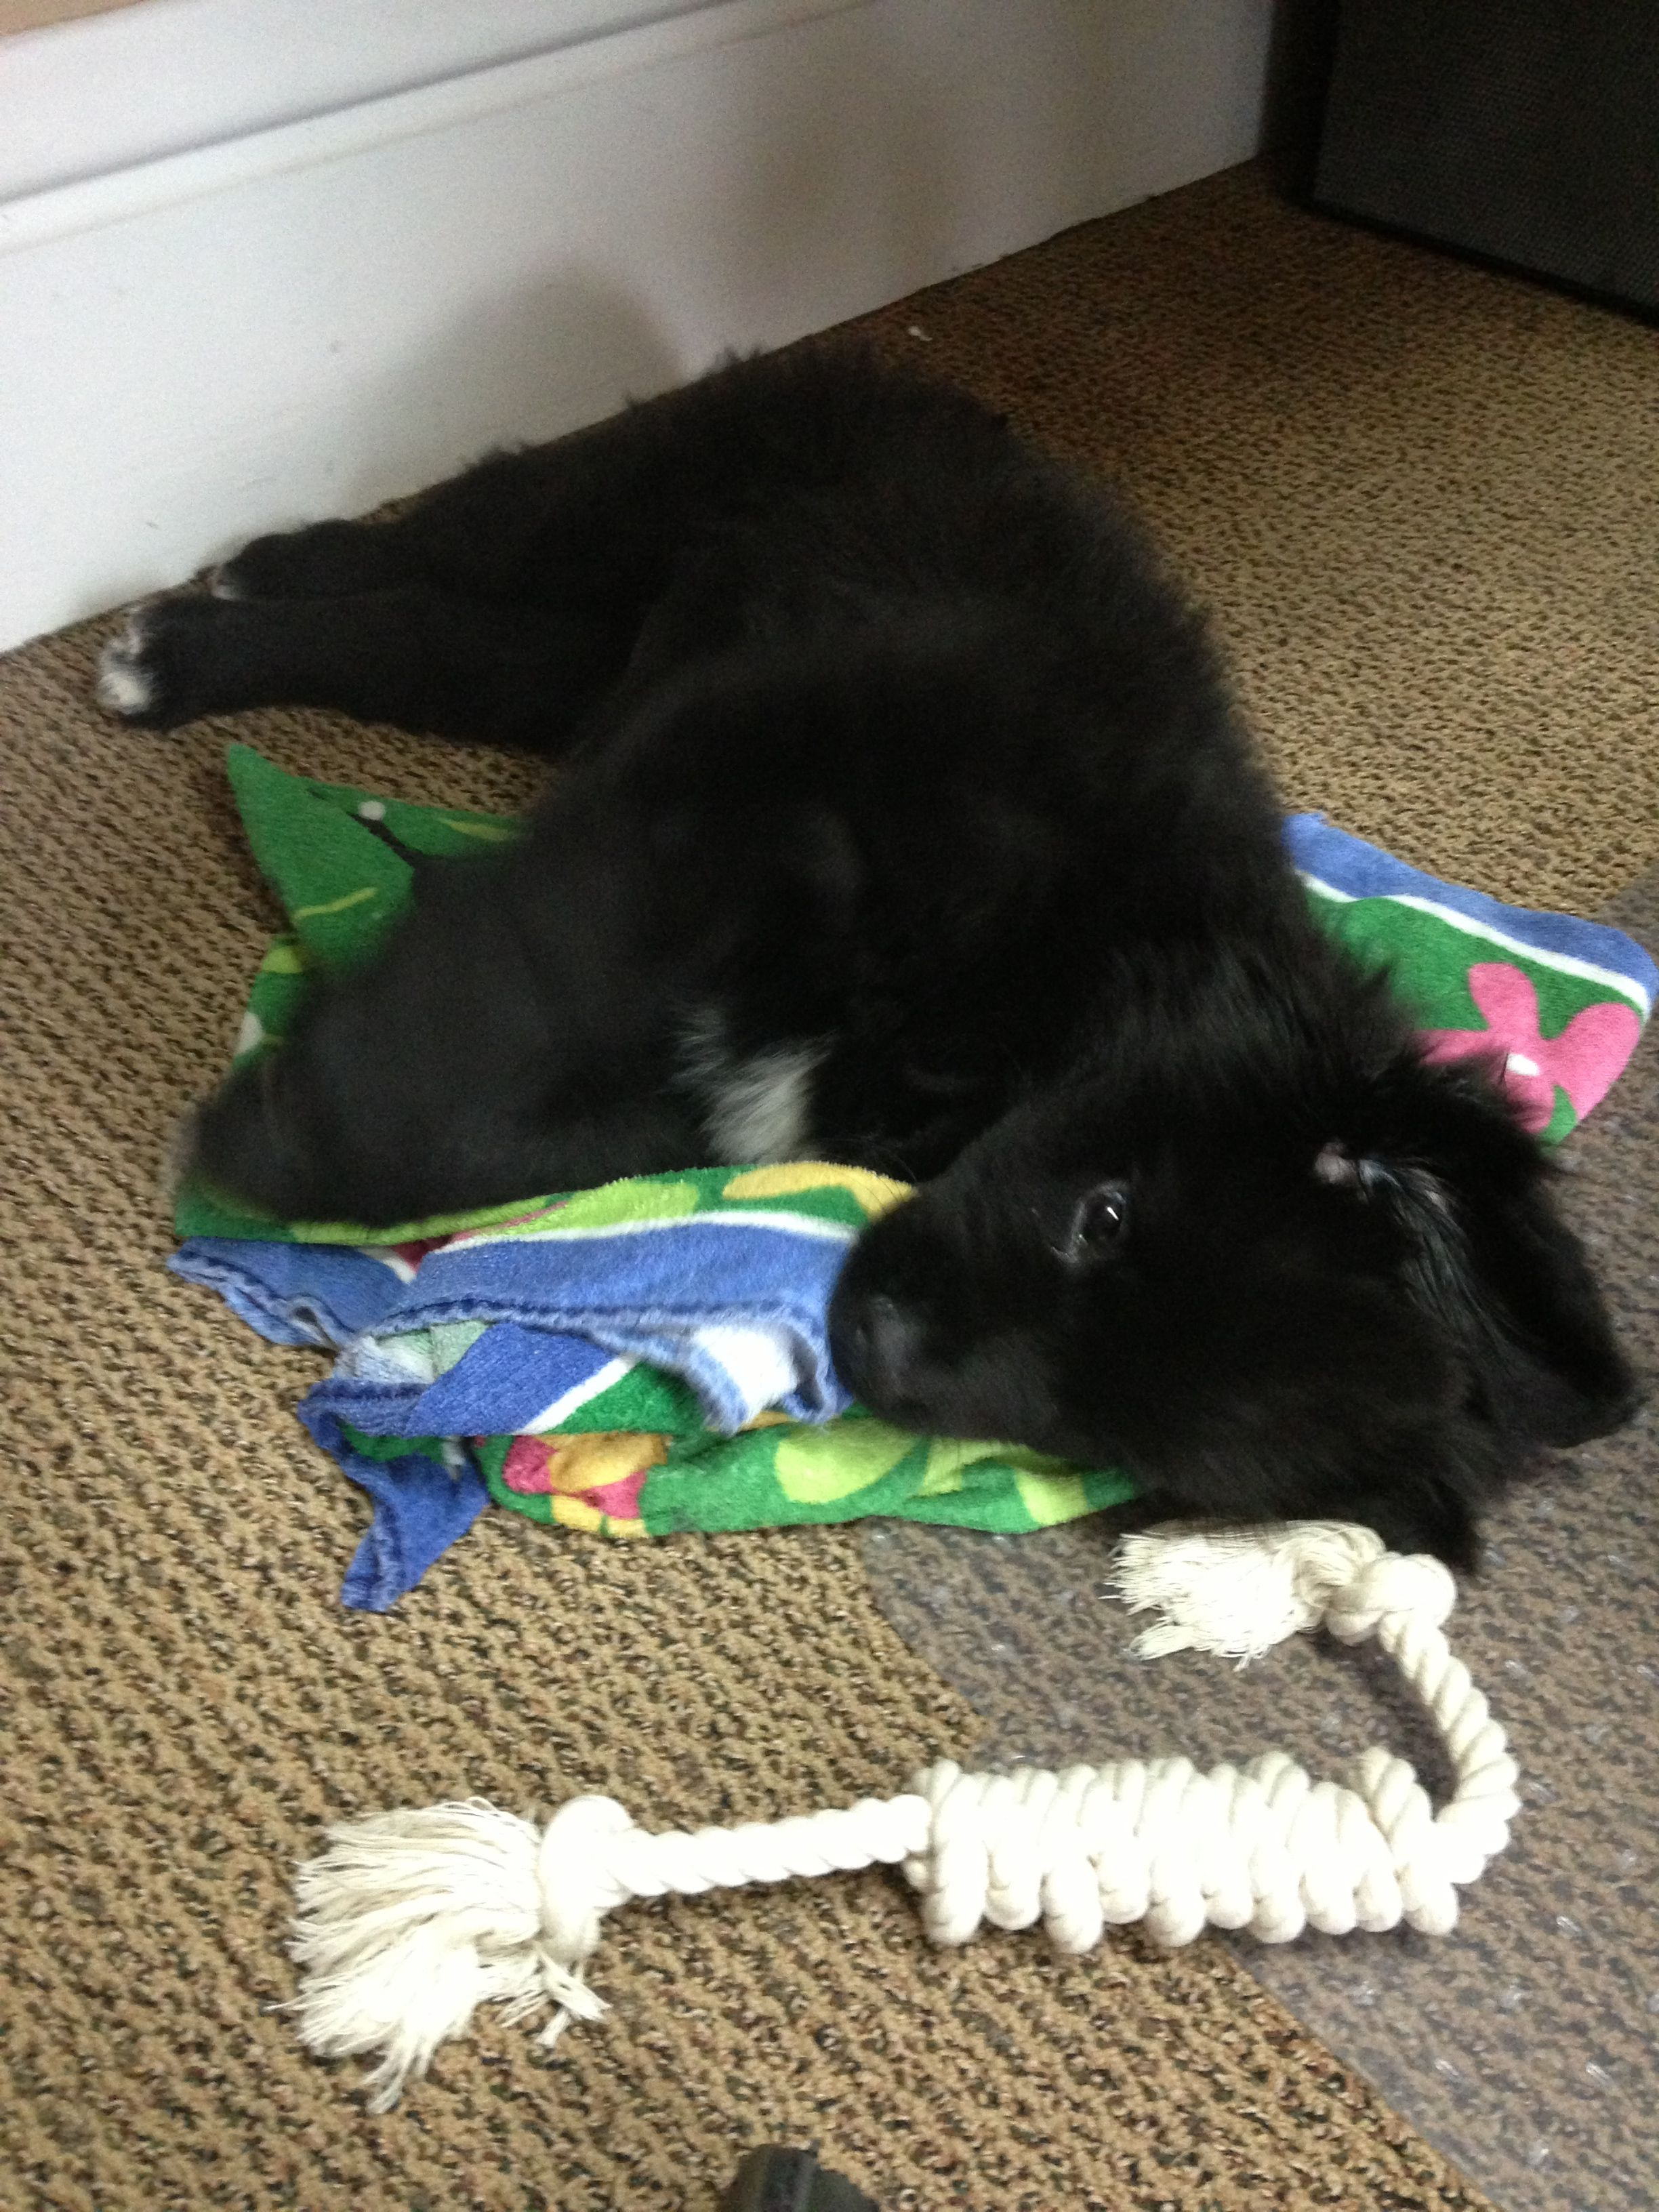 My adorable Newfoundland pup!!